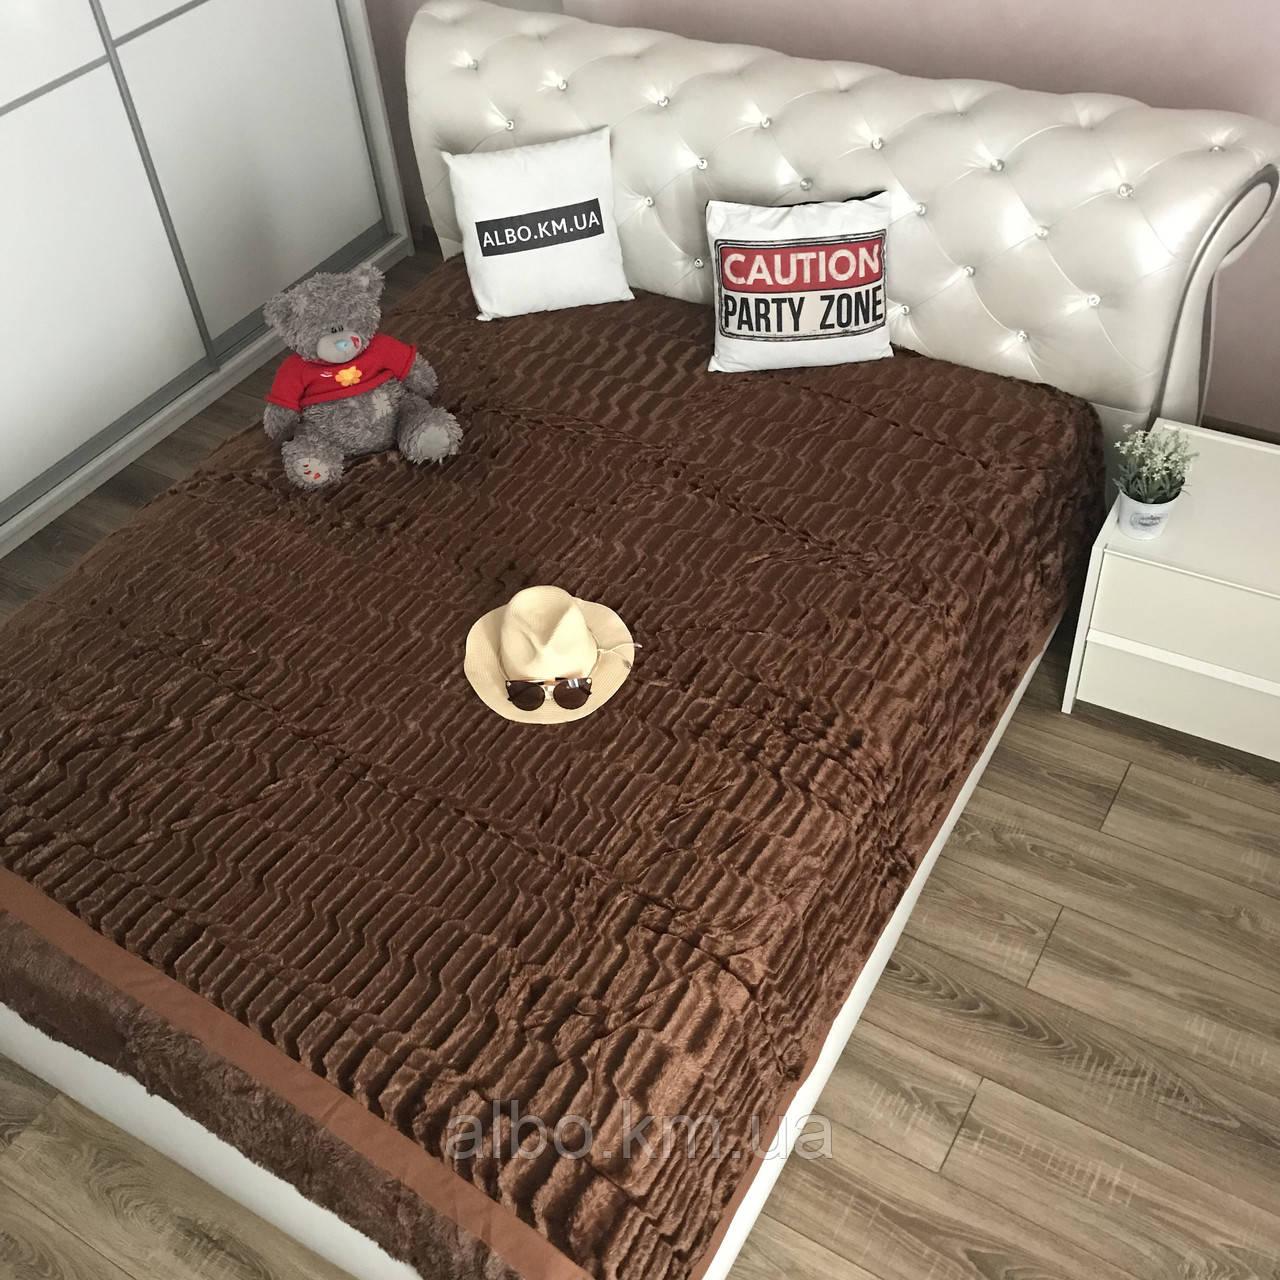 Покривало євро купити на ліжко диван, покривало норка на ліжко диван, шикарне покривало на ліжко диван, гарне покривало на ліжко